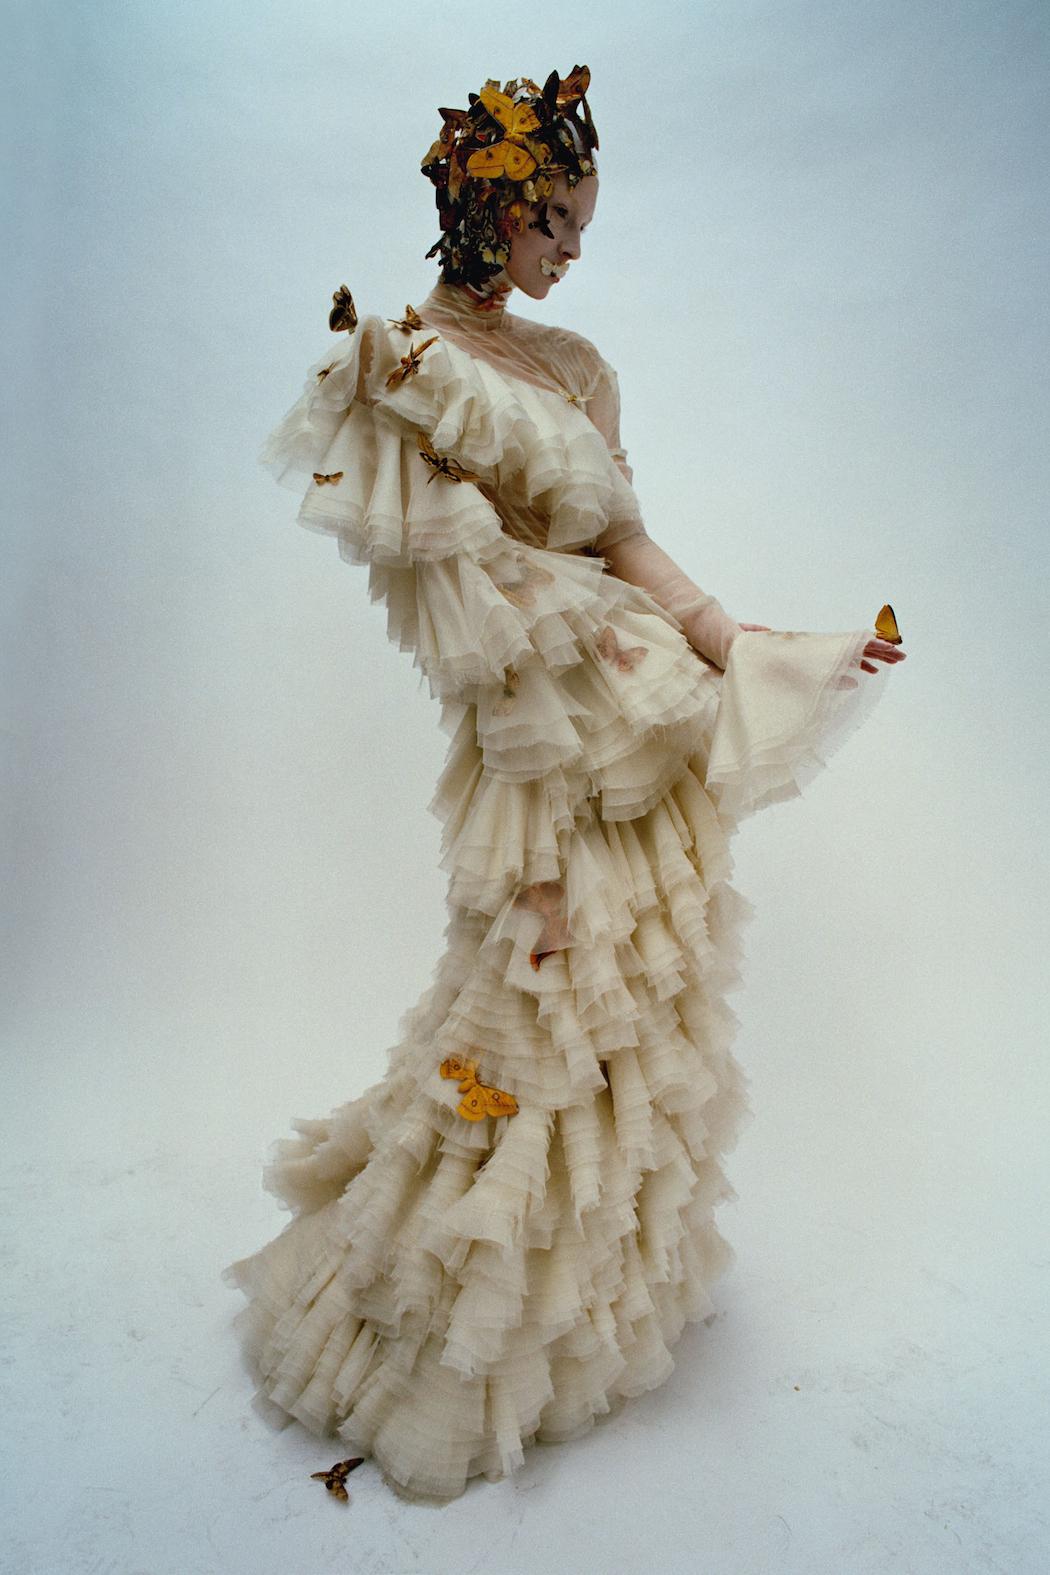 Dark Angel:McQueen Feature Models- Aya Jonaes, Xiao Wen Ju, Harleth Kuusik, Yumi Lambert & Nastya Sten Photographer- Tim Walker Stylist- Kate Phelan05